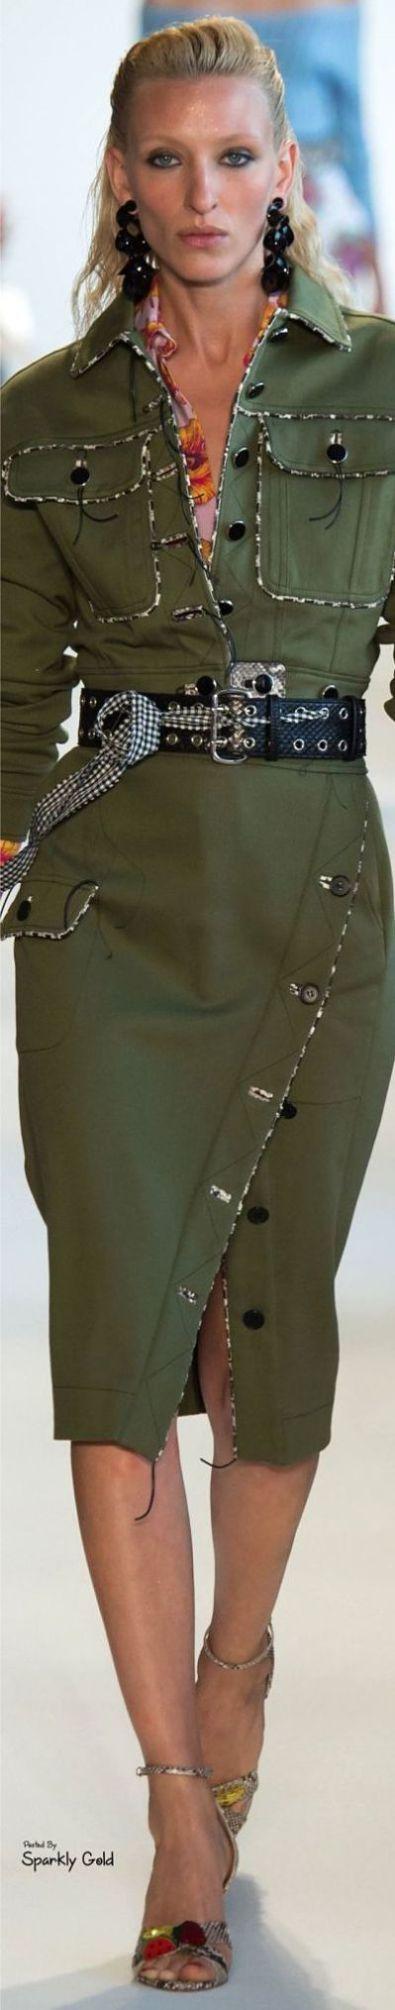 деловое платье рубашка цвета хаки